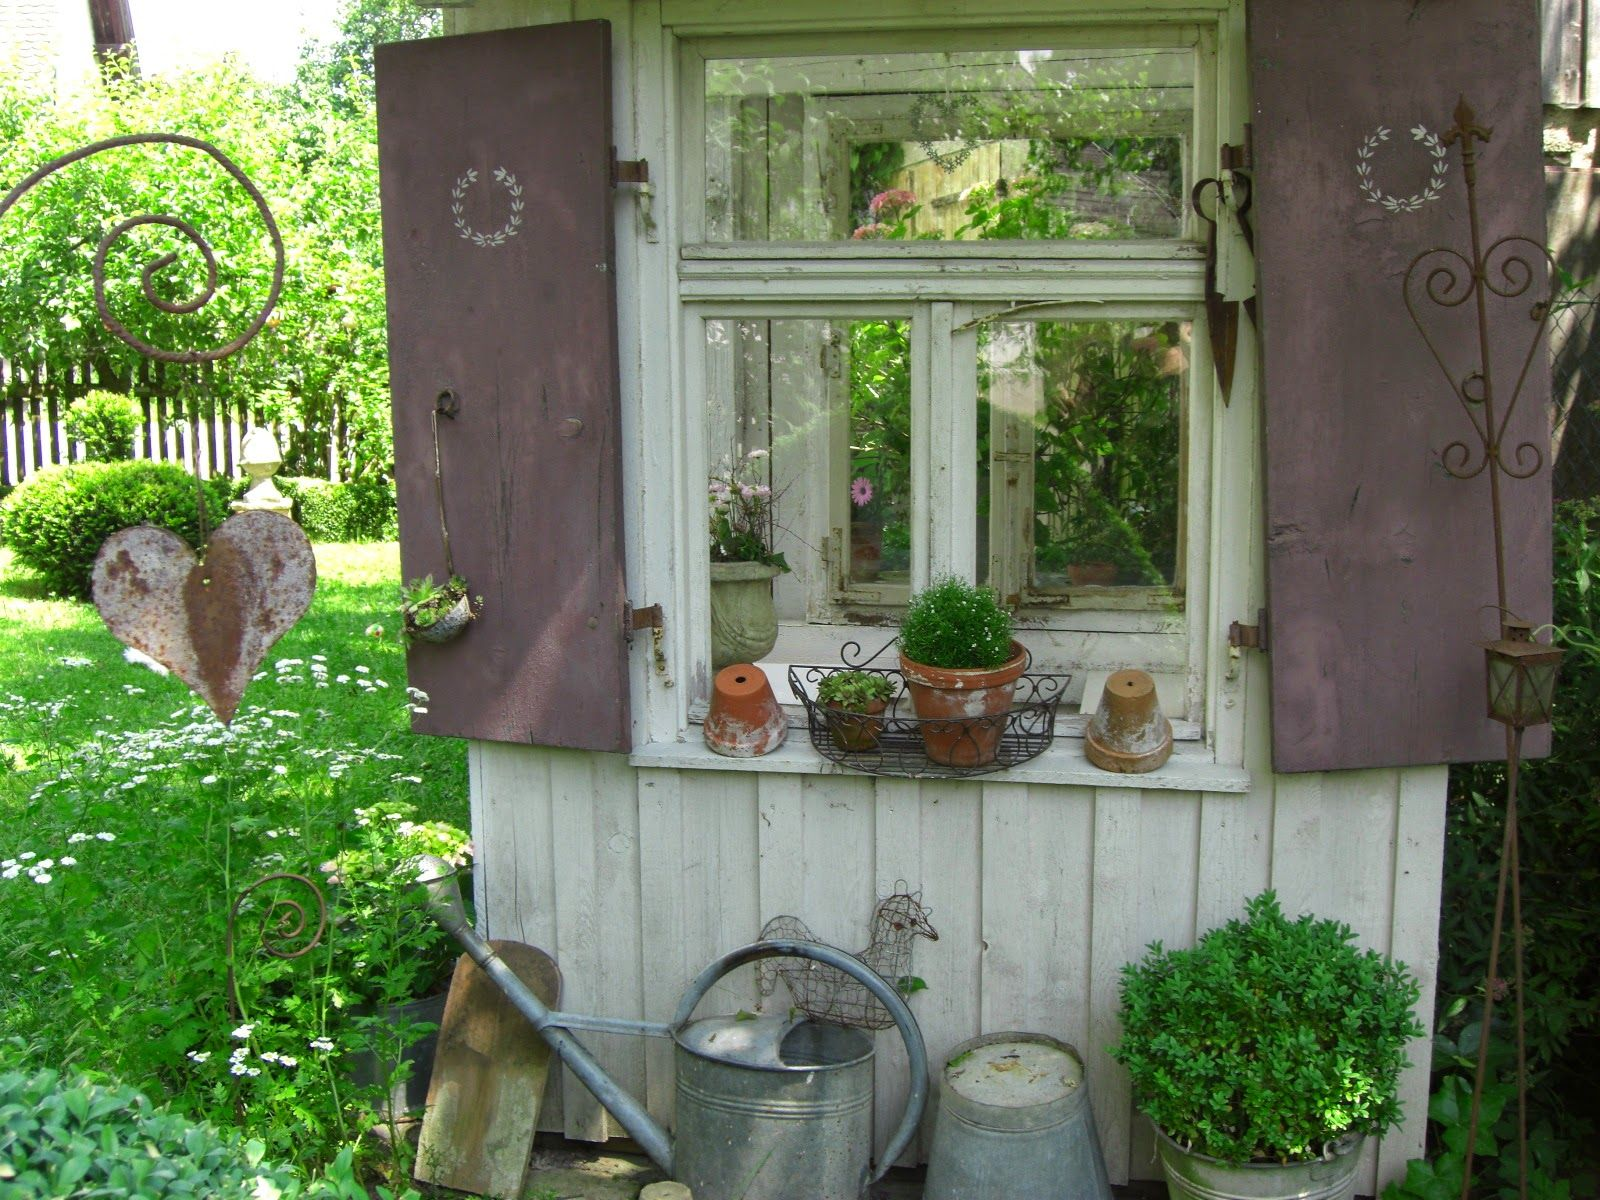 landliebe cottage garden garden elements pinterest. Black Bedroom Furniture Sets. Home Design Ideas